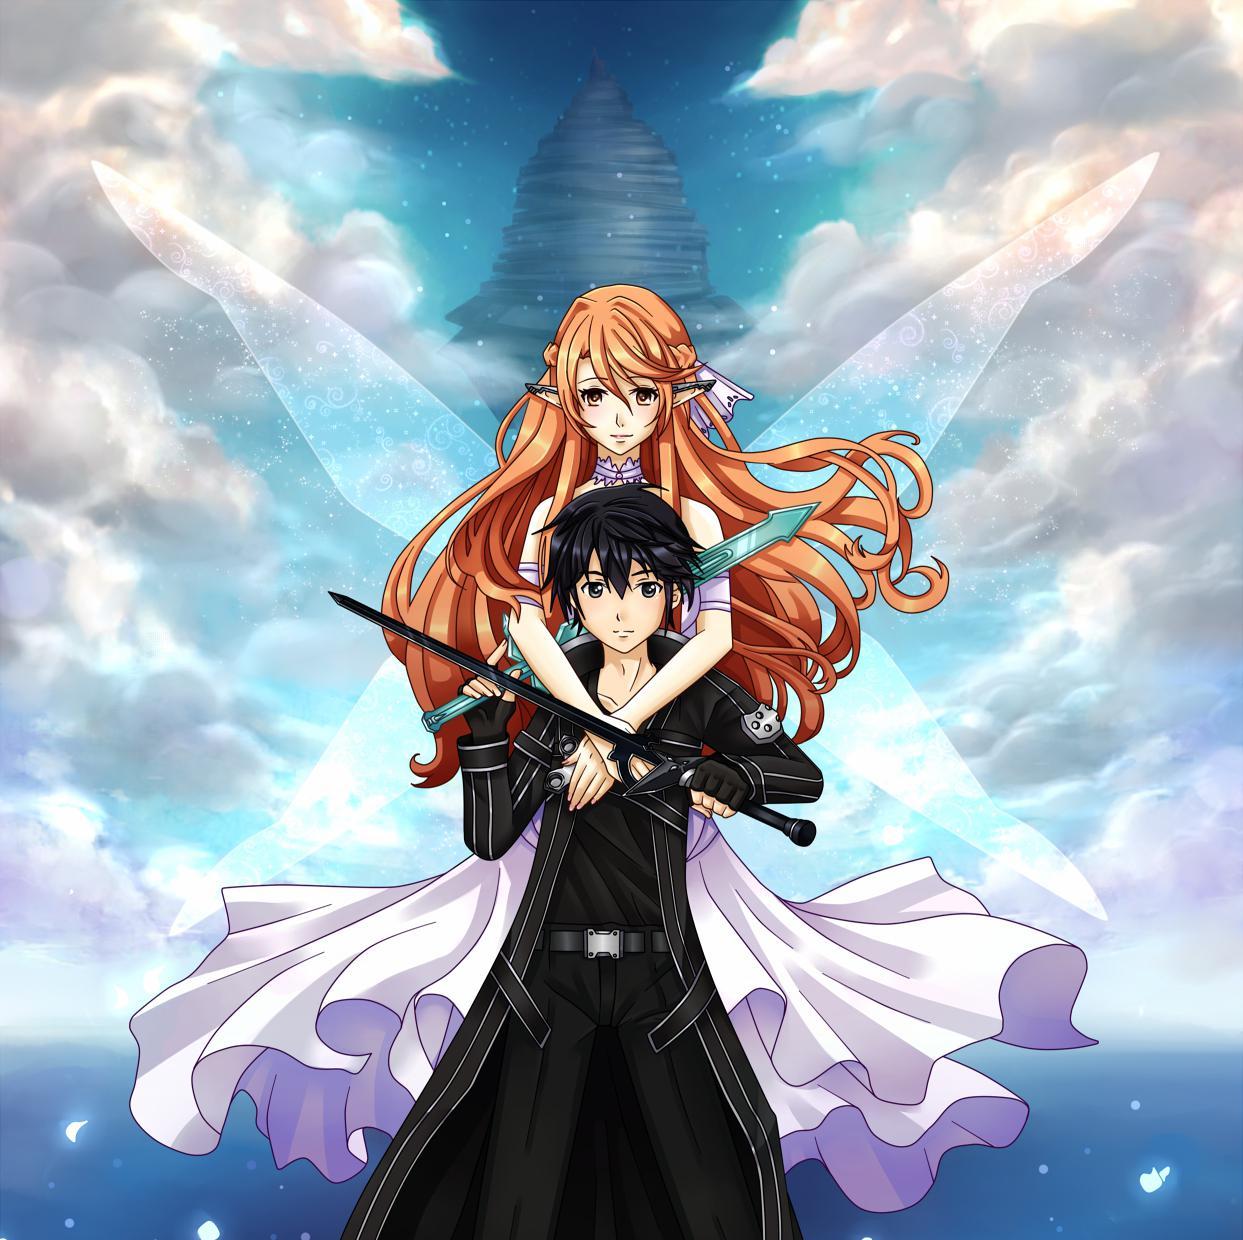 Online Wallpaper: Kirito And Asuna Wallpaper HD